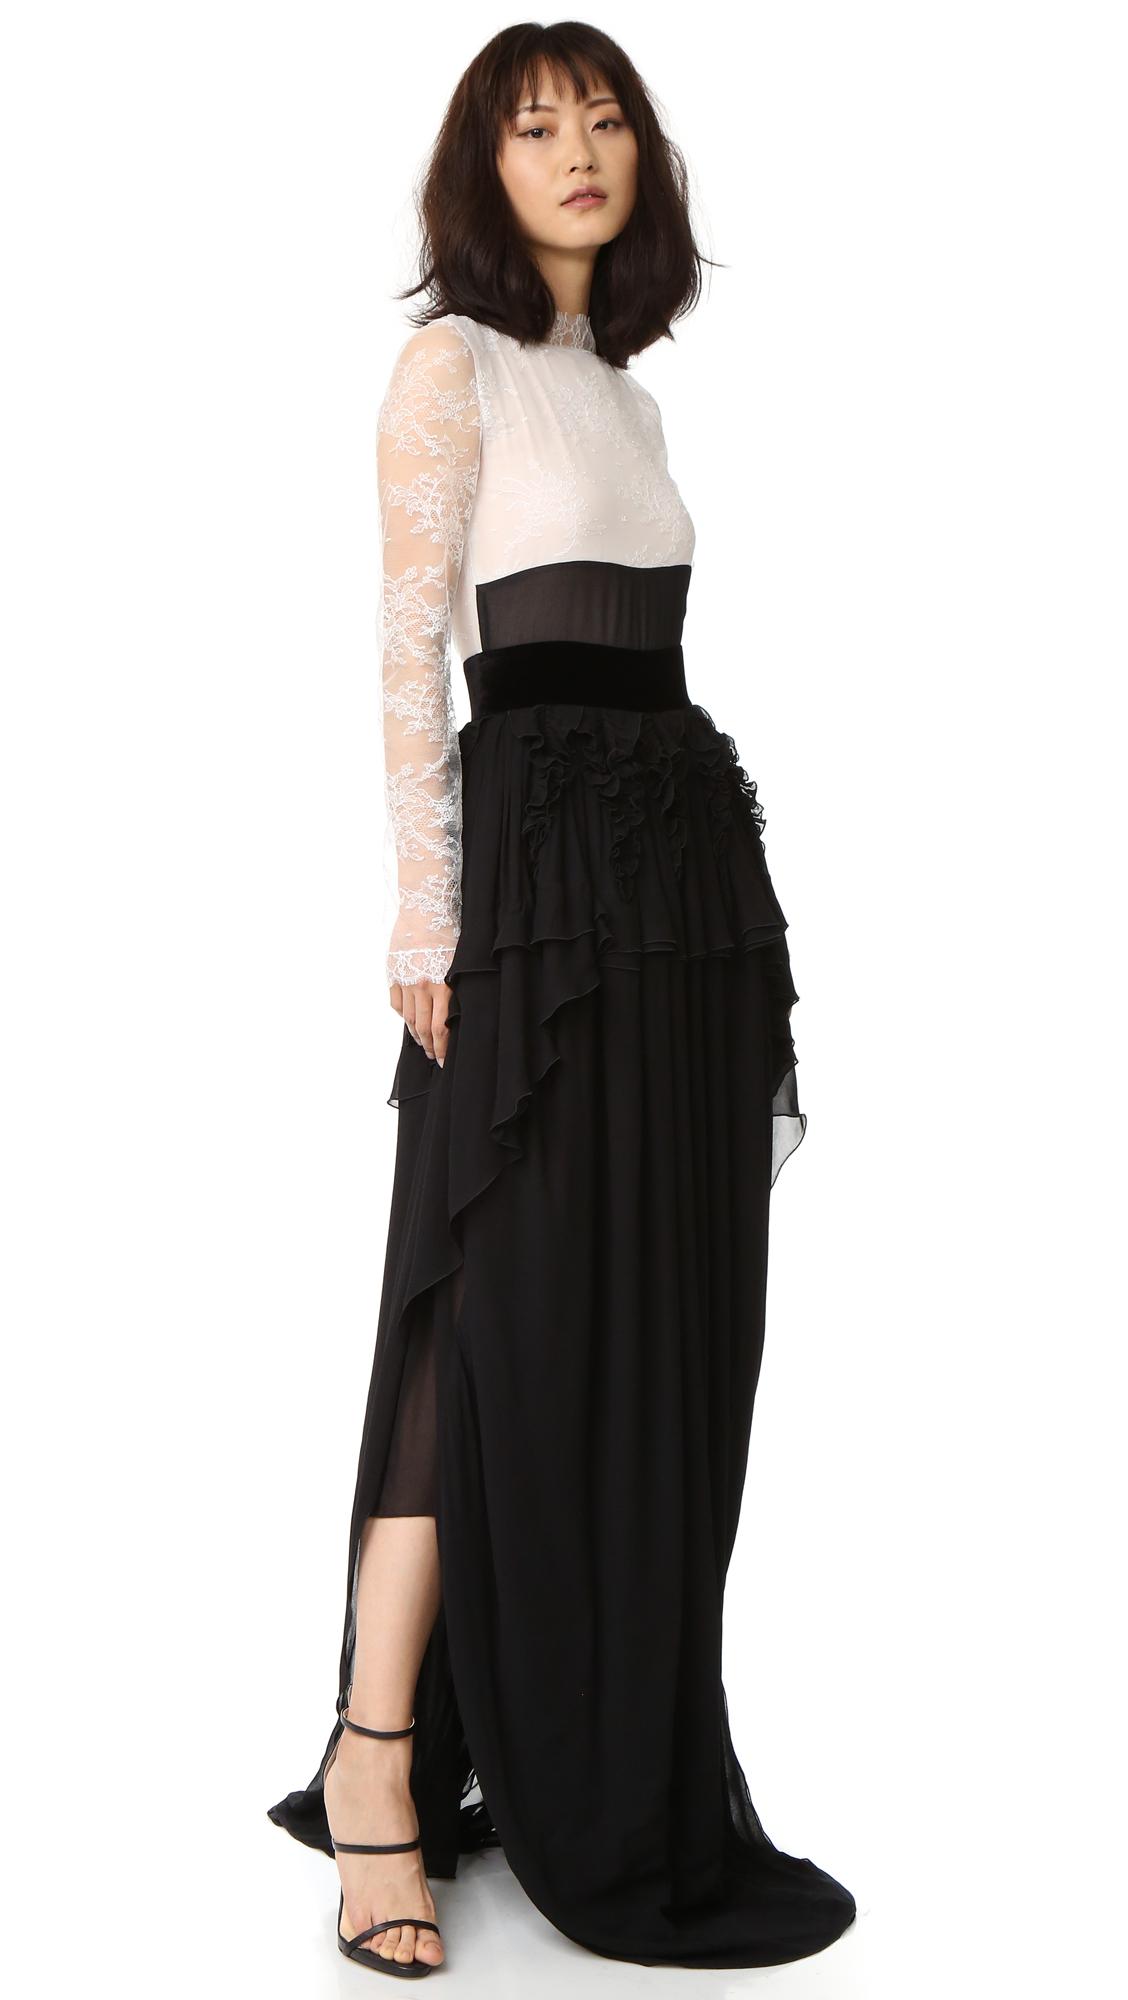 Antonio Berardi Long Sleeve Gown - Black/White at Shopbop